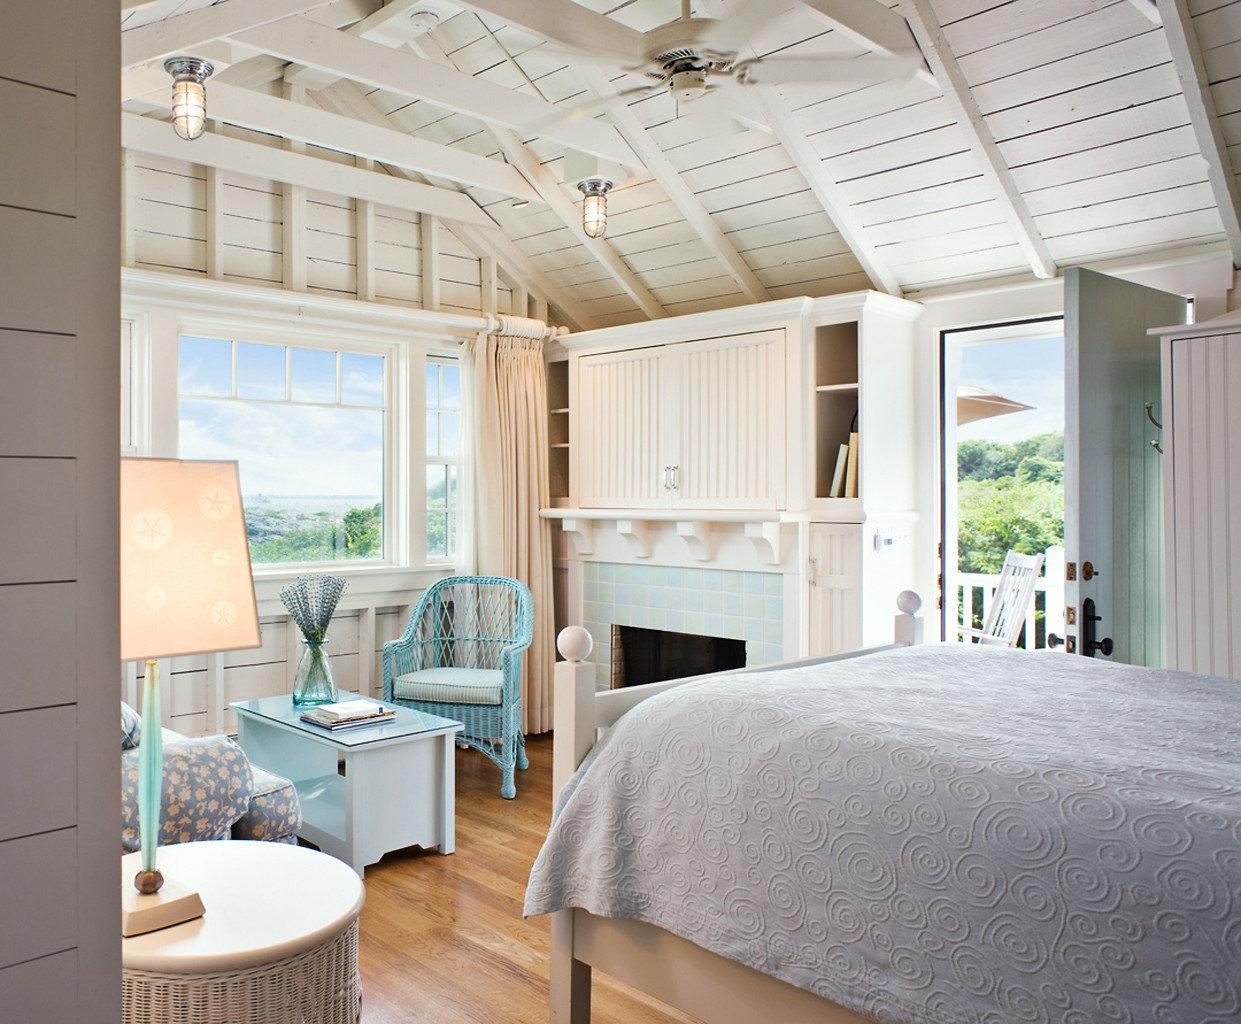 Bedroom at Castle Hill Inn, Newport, RI